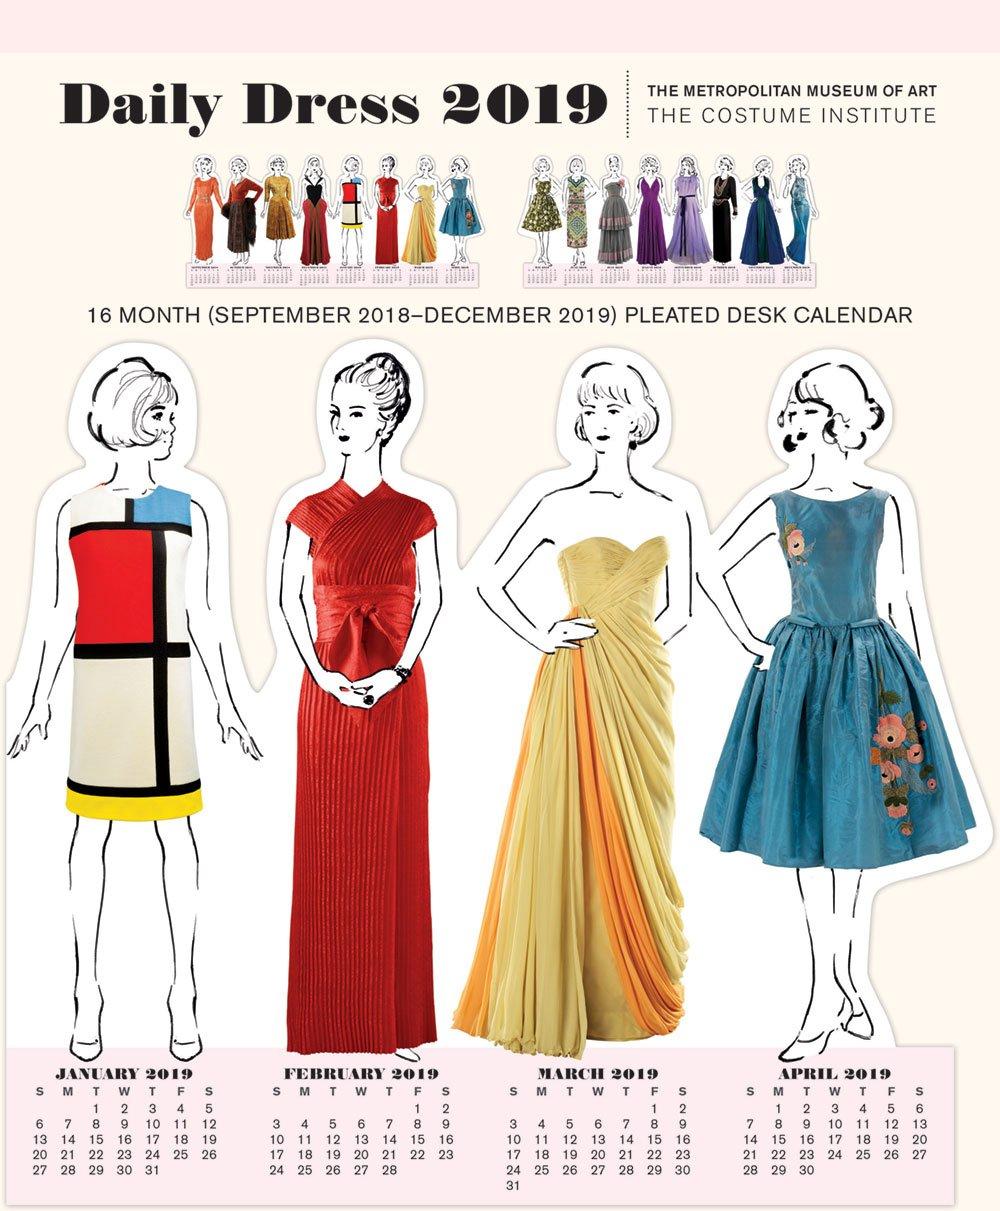 February 2019 Fashion Calendar Daily Dress 2019 Pleated Desk Calendar: The Metropolitan Museum of